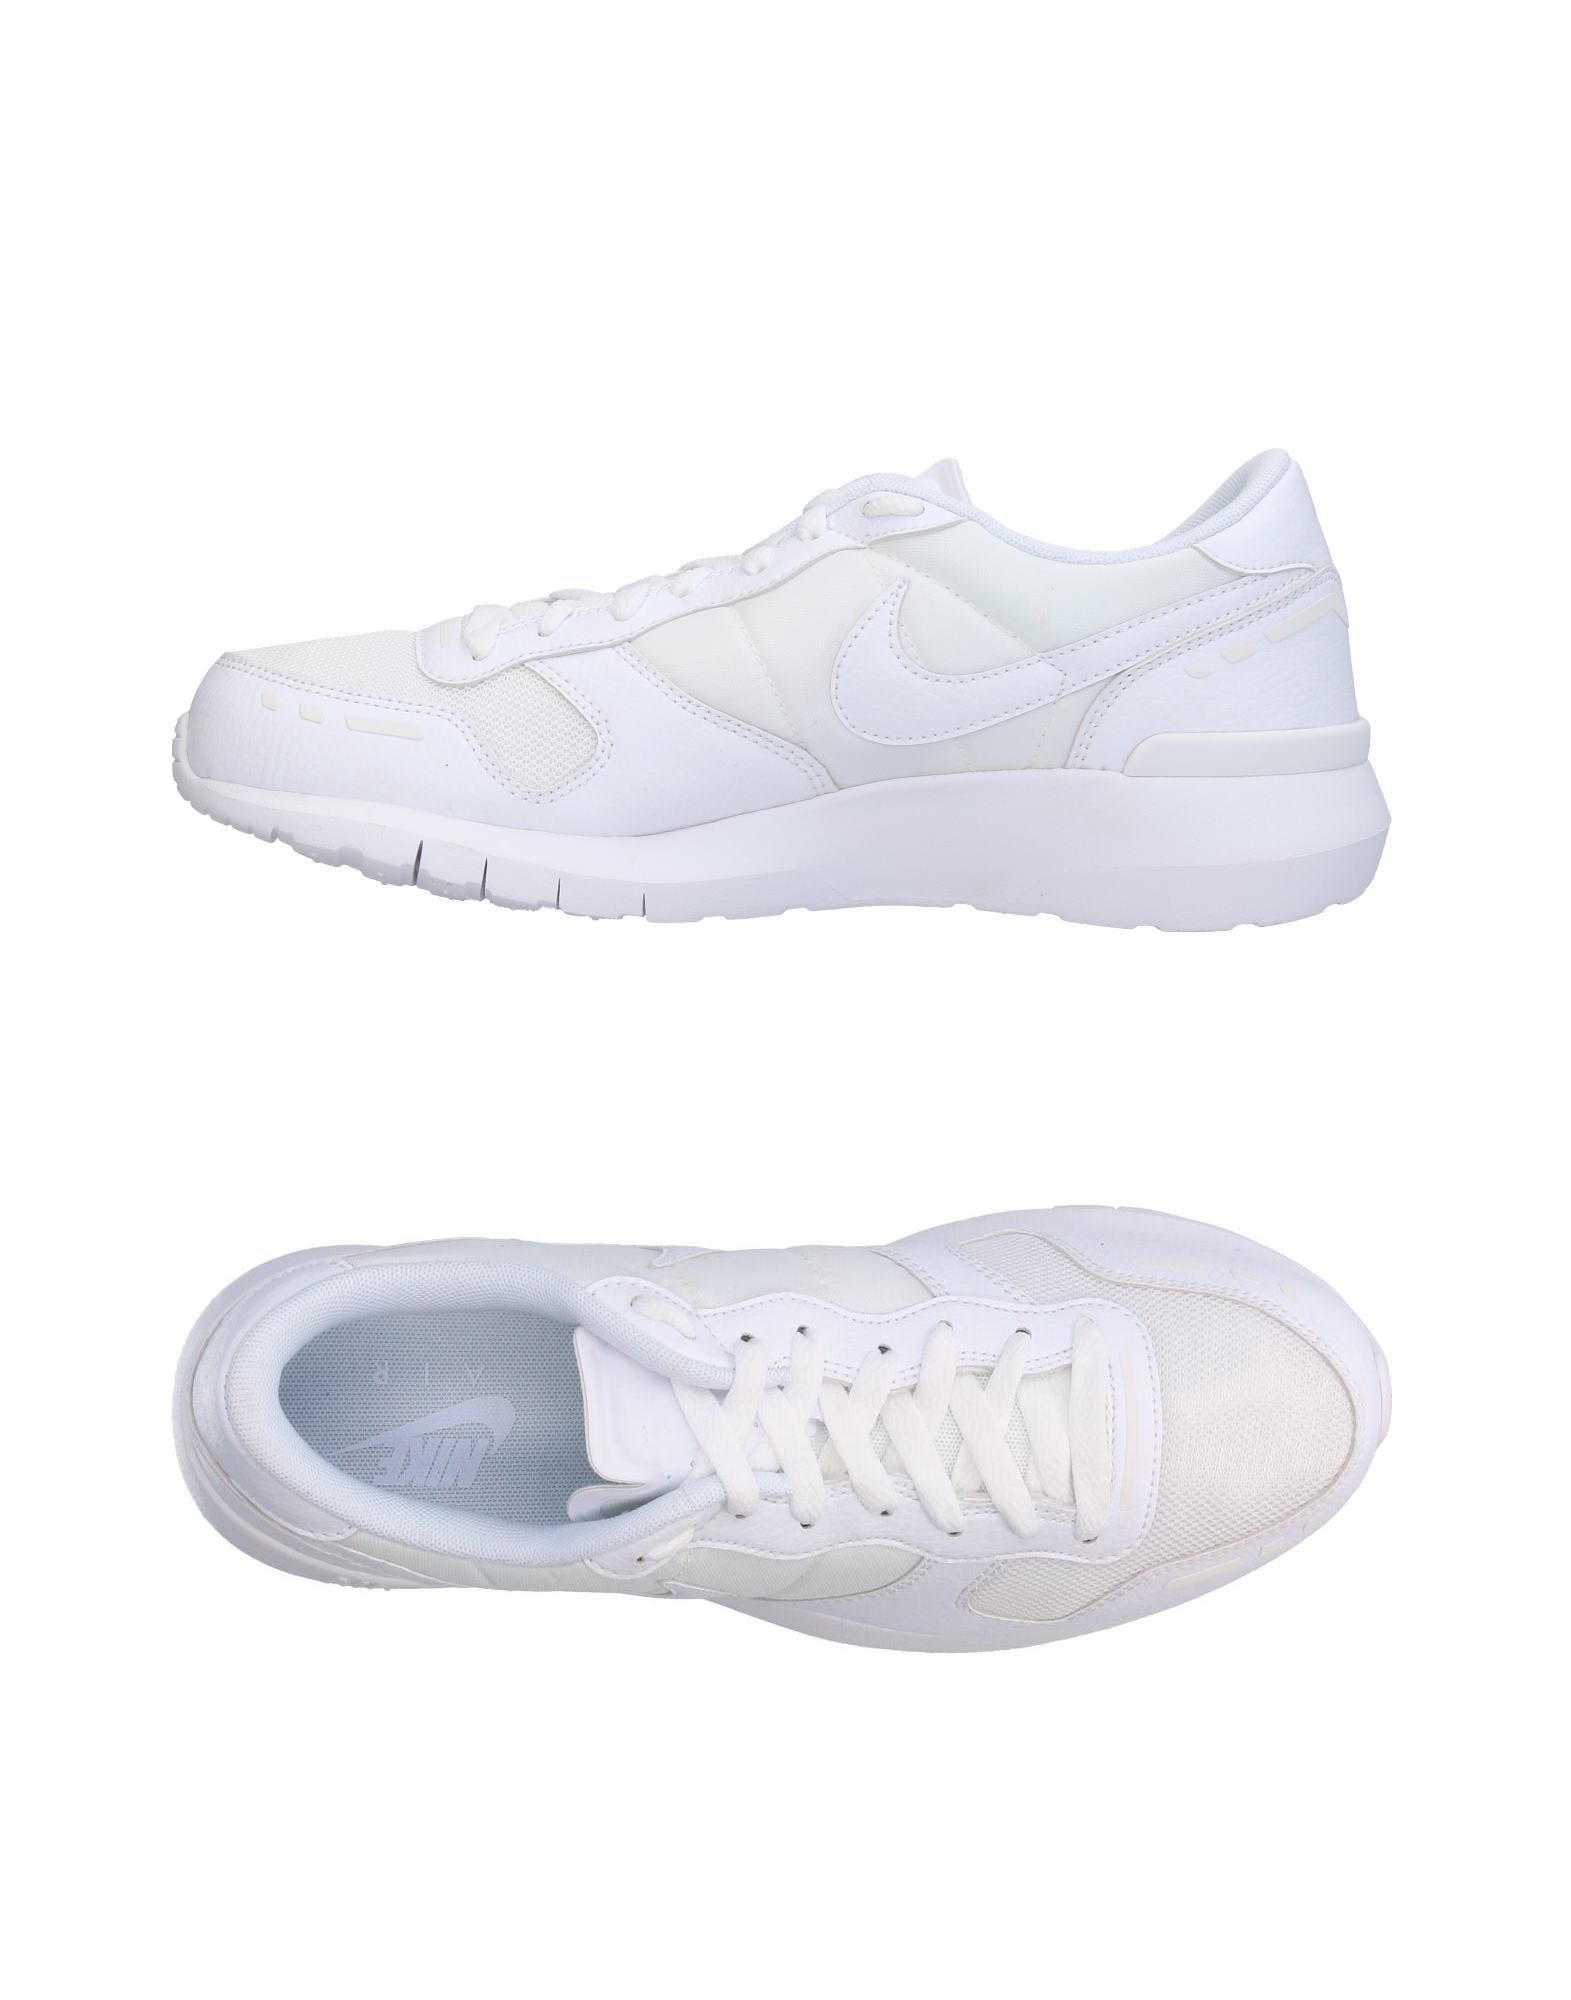 Moda Sneakers Nike Uomo - 11378430XT